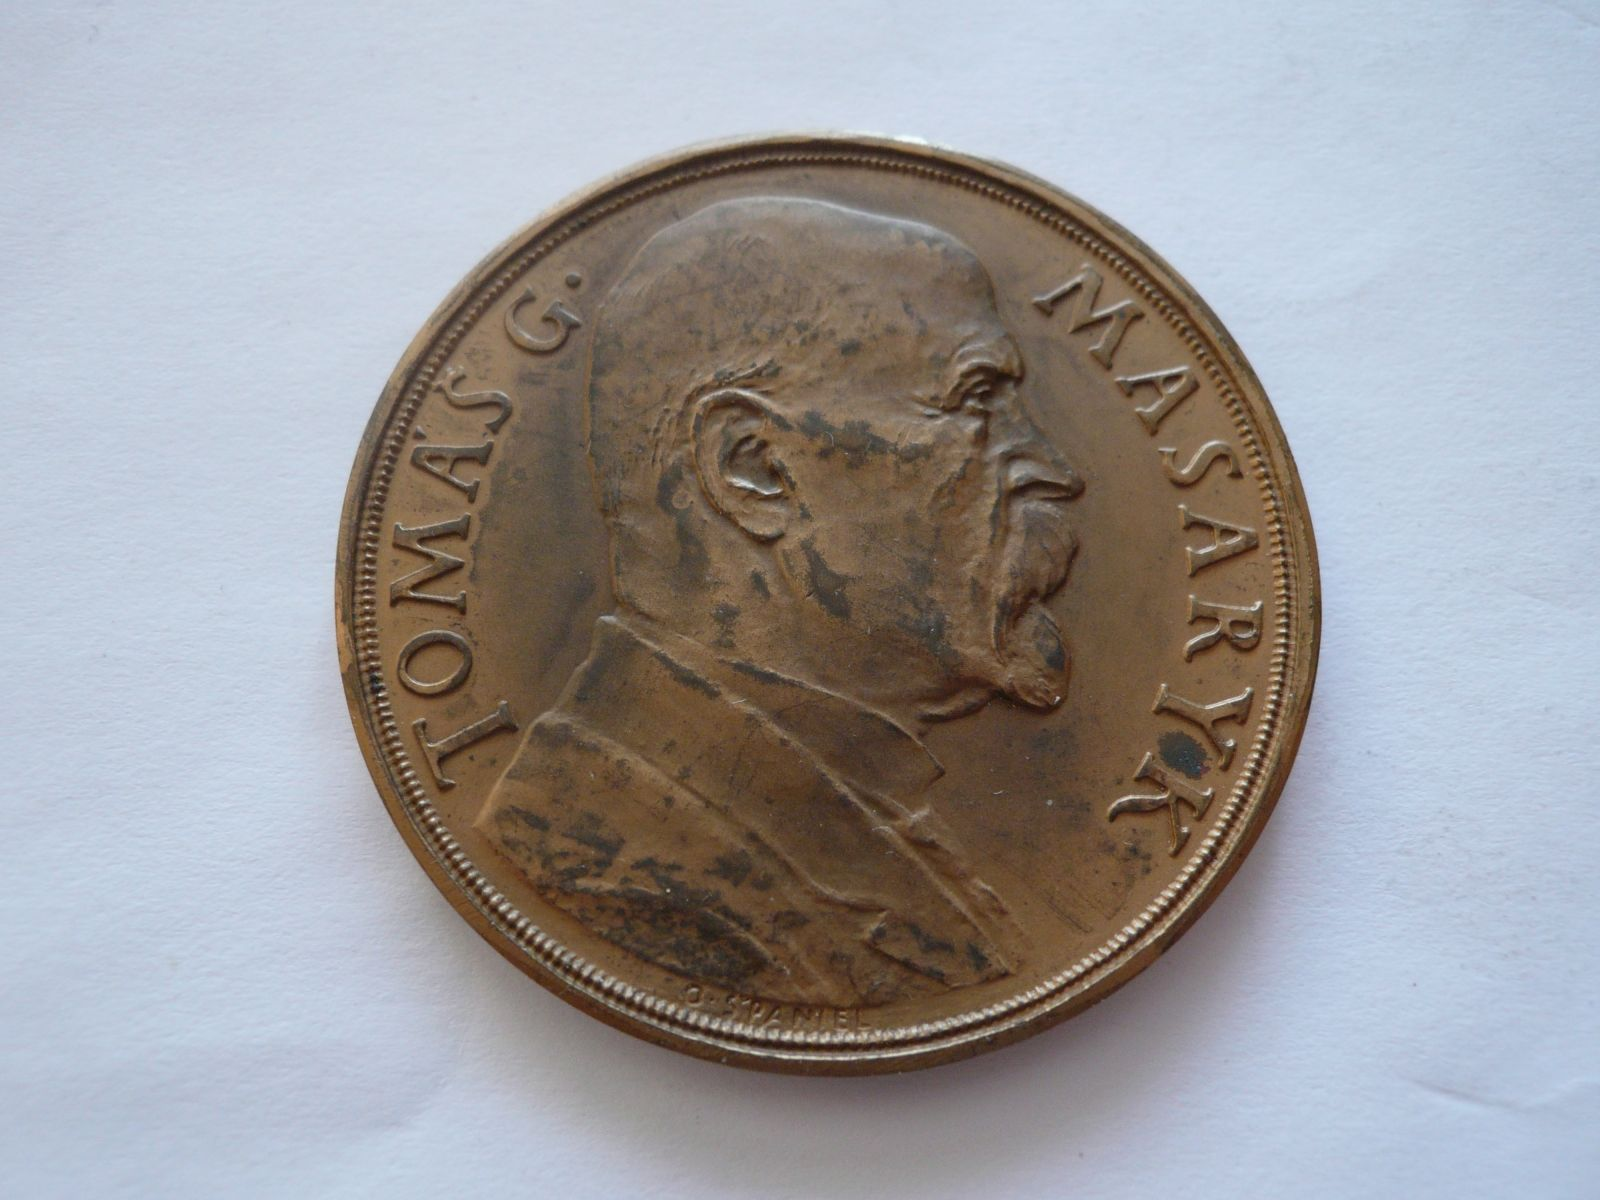 85 narozeniny TGM 1935 ?50 ČSR